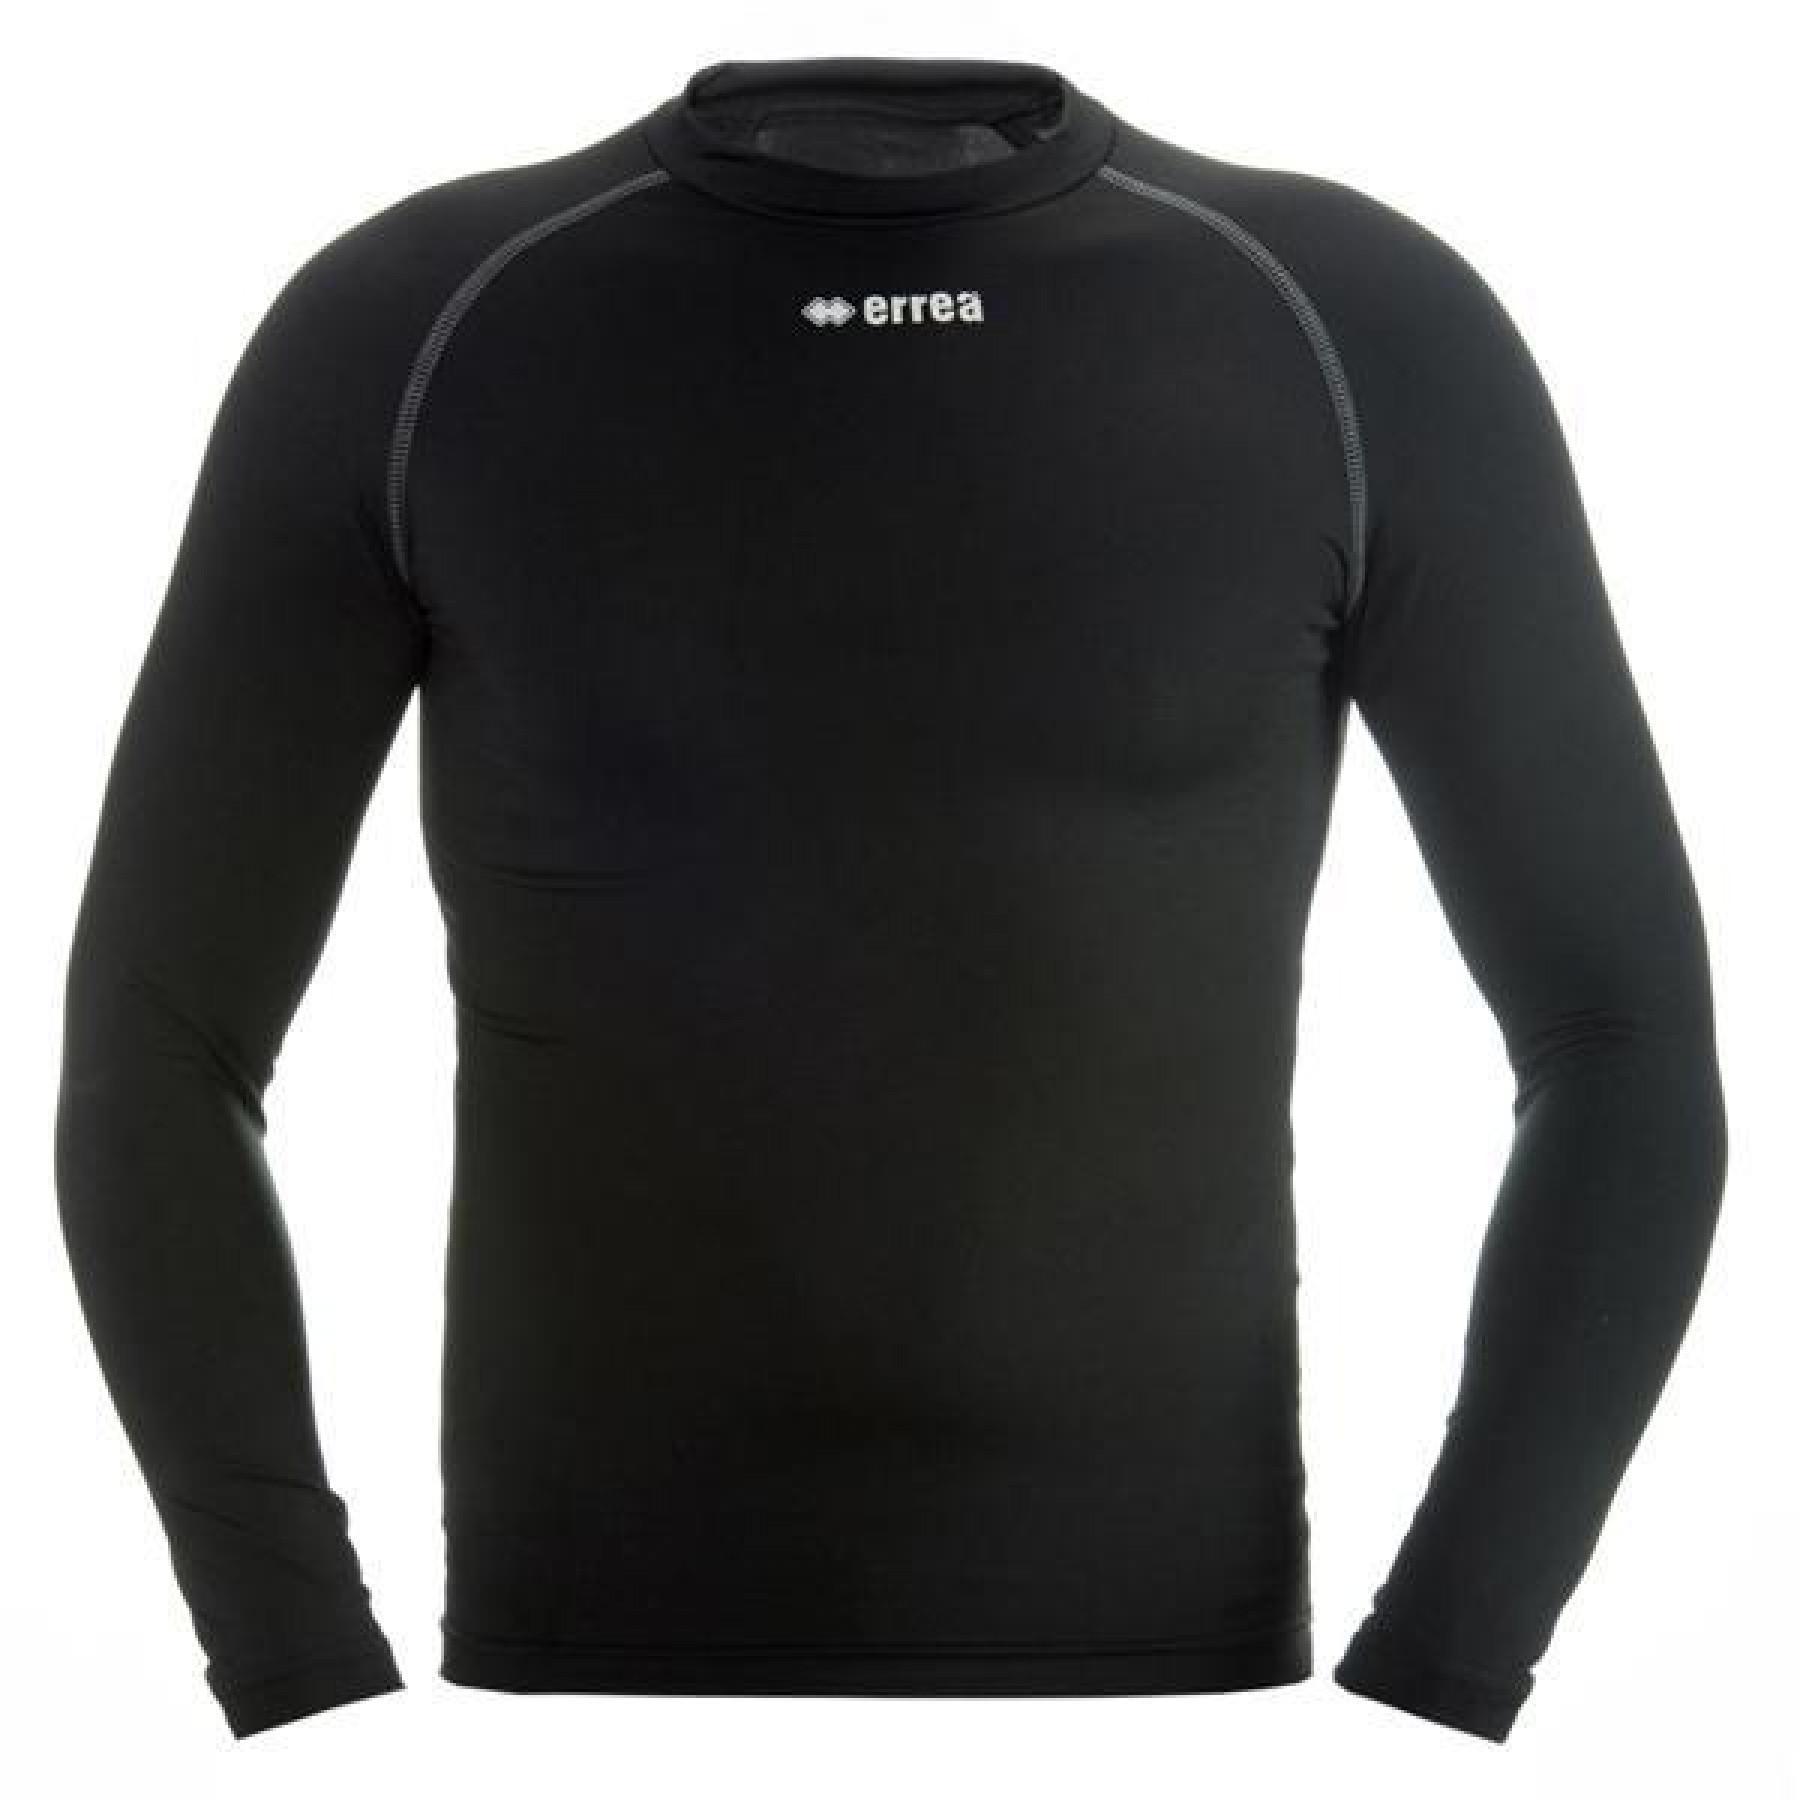 Errea Ermes compression jersey long sleeve